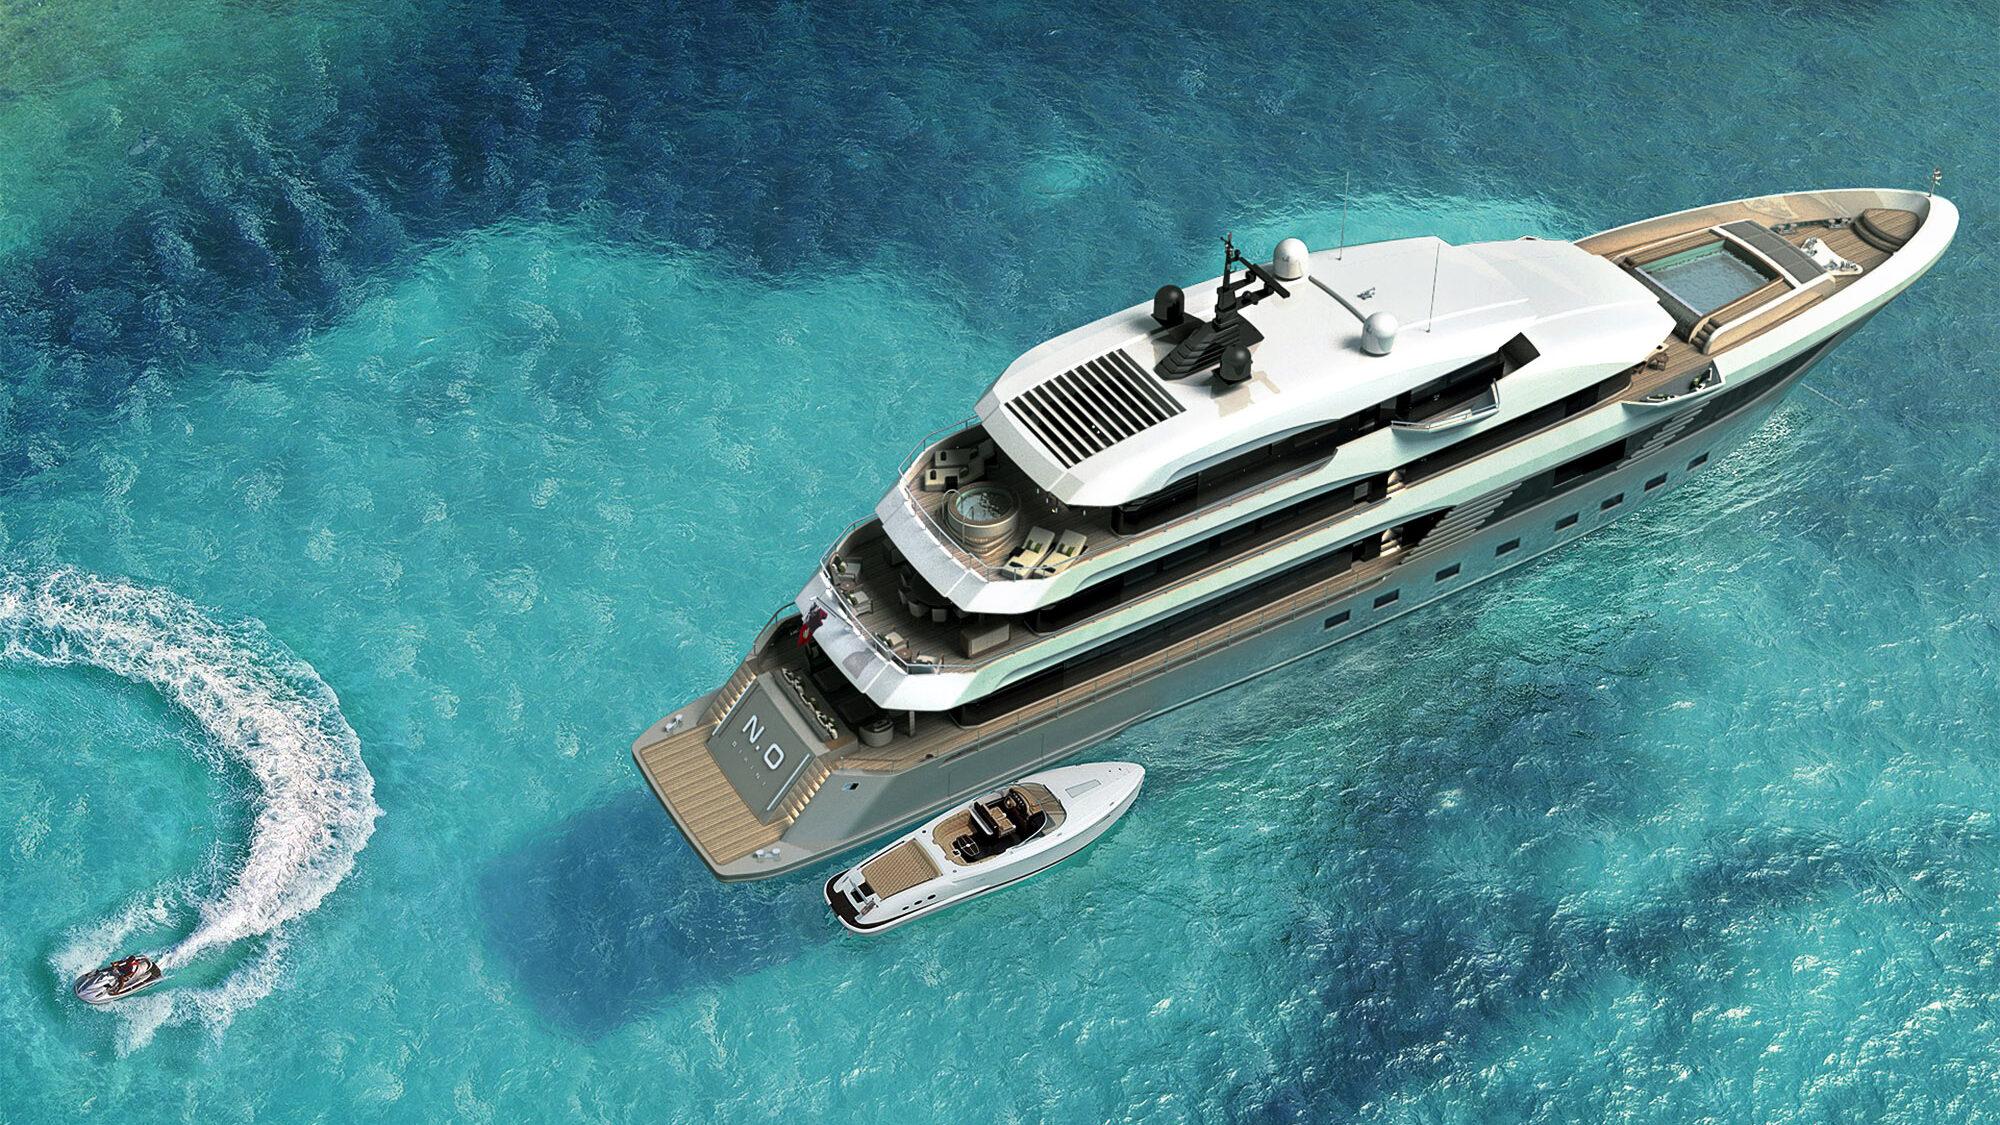 UAE Shipyard Unveils World's Largest Composite Superyacht